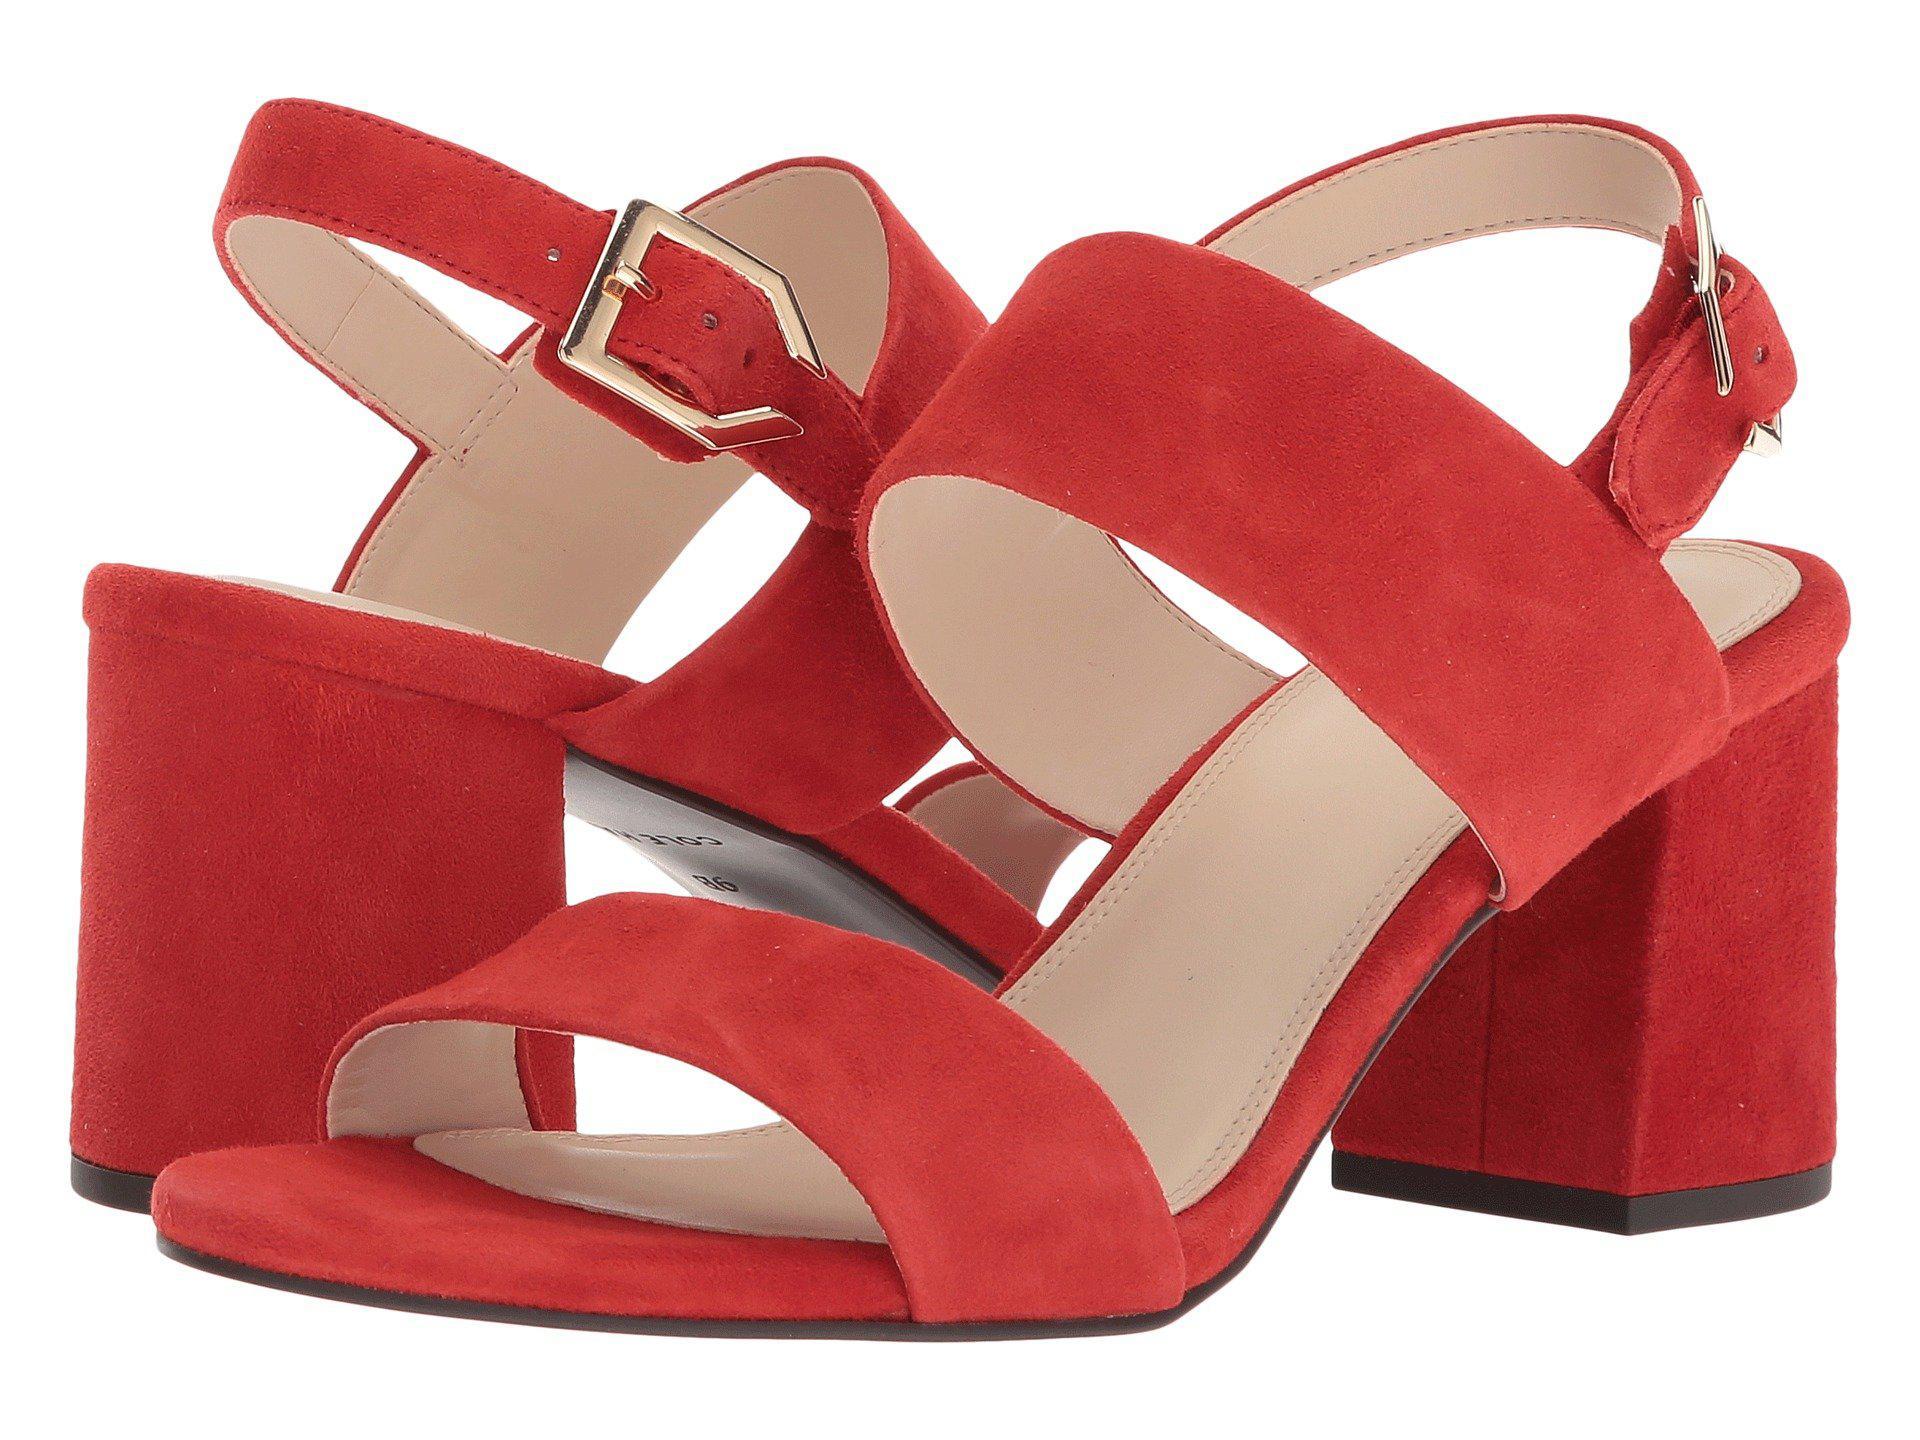 bb5c3b887fb Lyst - Cole Haan Avani City Sandal in Red